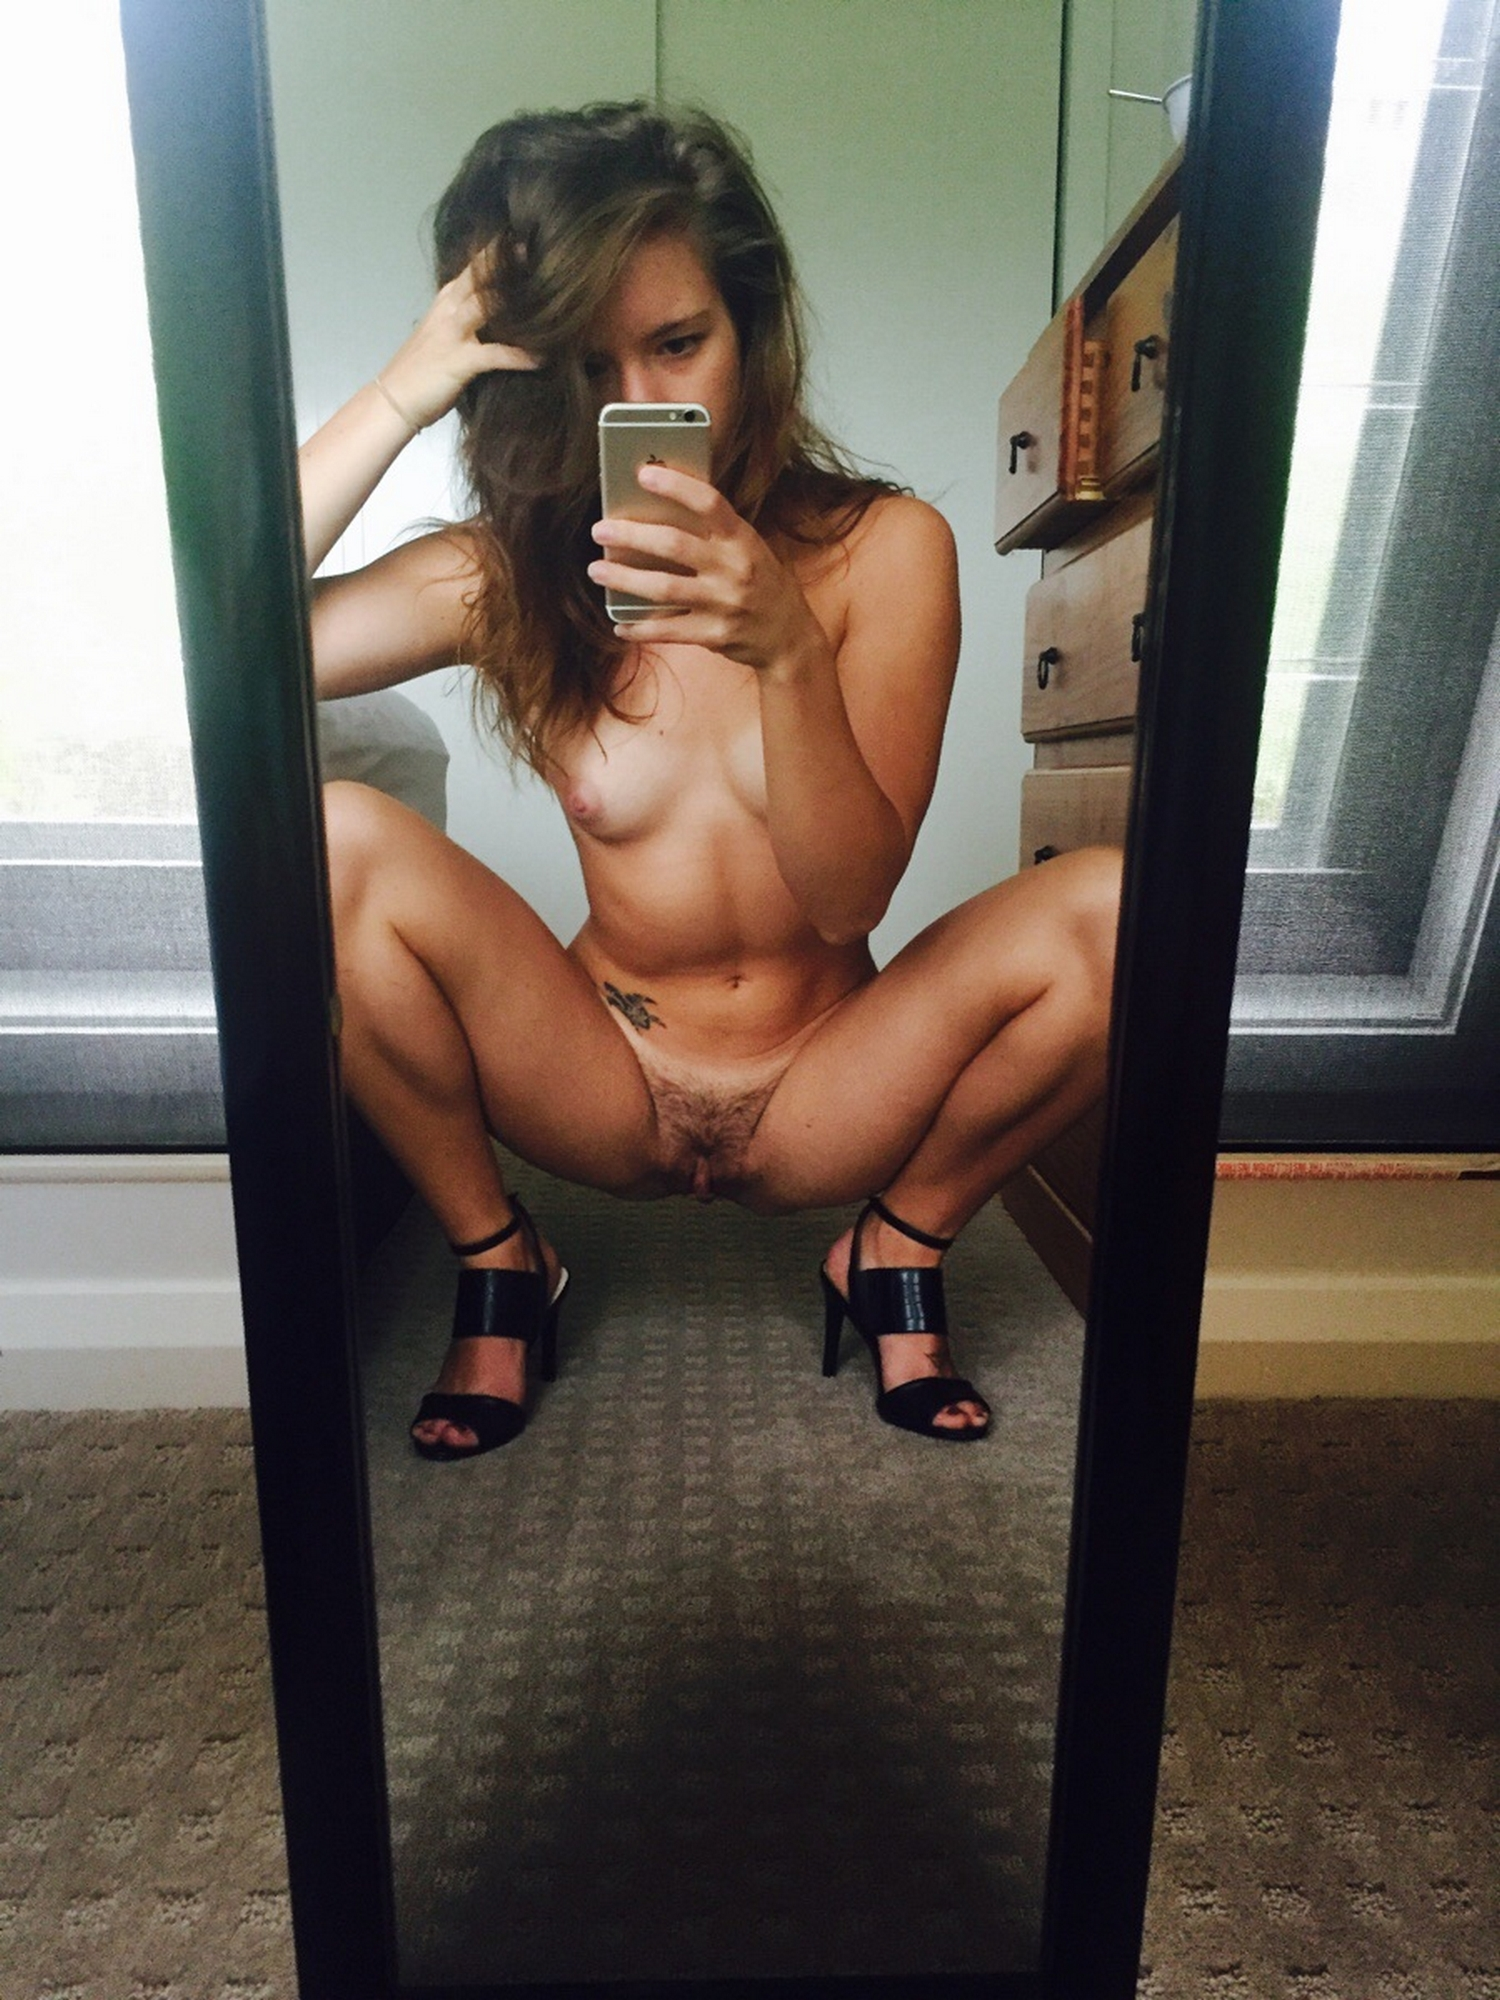 Низкая студентка раздевается дома на камеру секс фото и порно фото